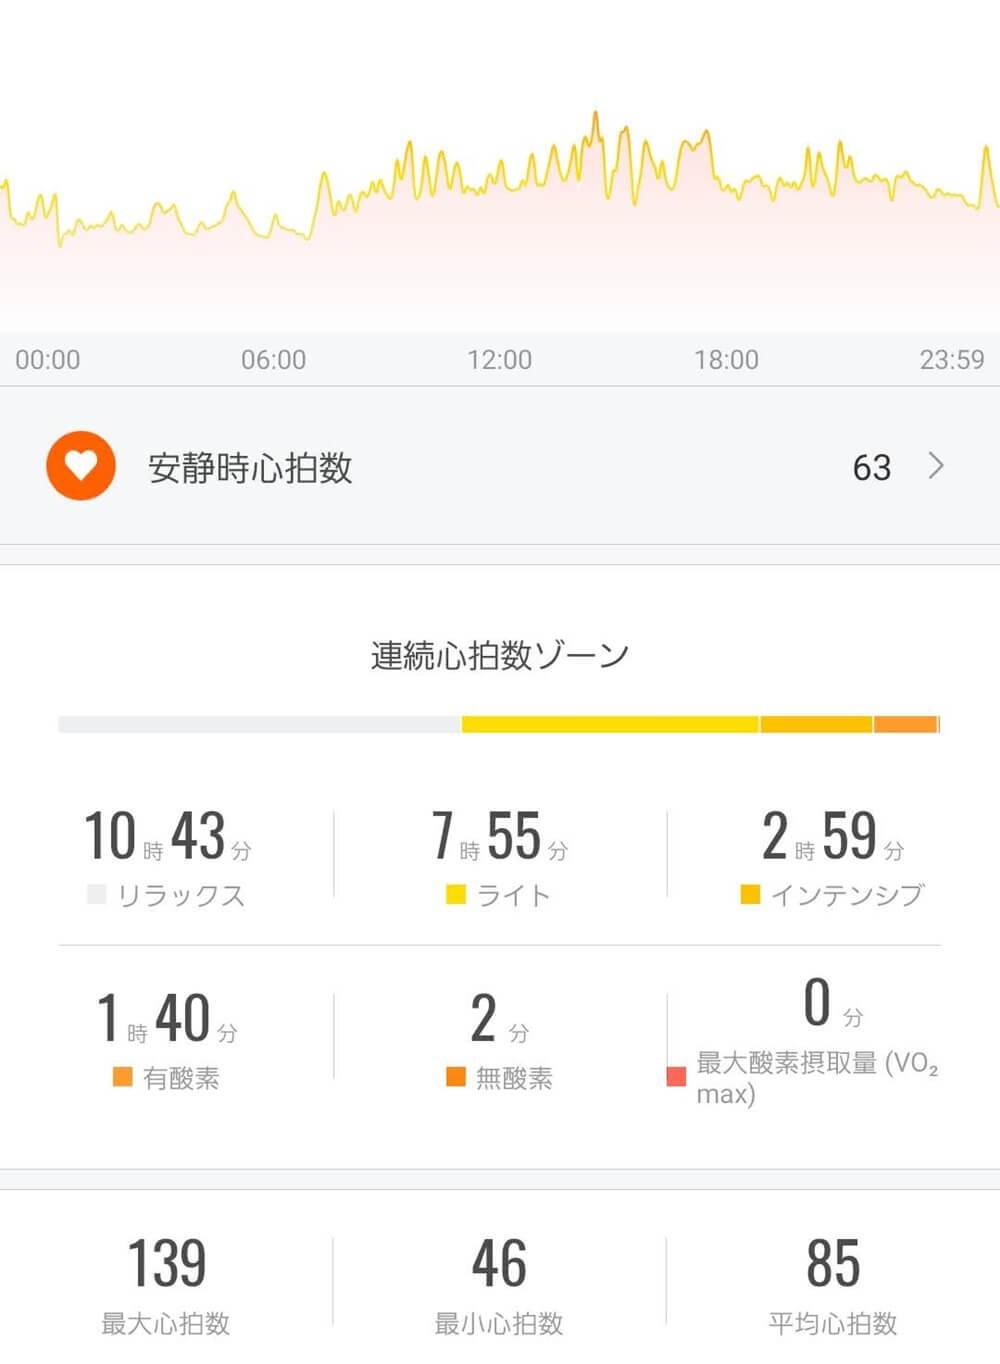 Xiaomi Mi スマートバンド5 日本版 bluetooth5.0 【日本正規代理店品】mi band 5 日本語生理周期予測 健康管理 11スポーツモード追加 24時間心拍測定睡眠管理消費カロリー計 画面明るさ調整 着信通知 50M防水 ブラック